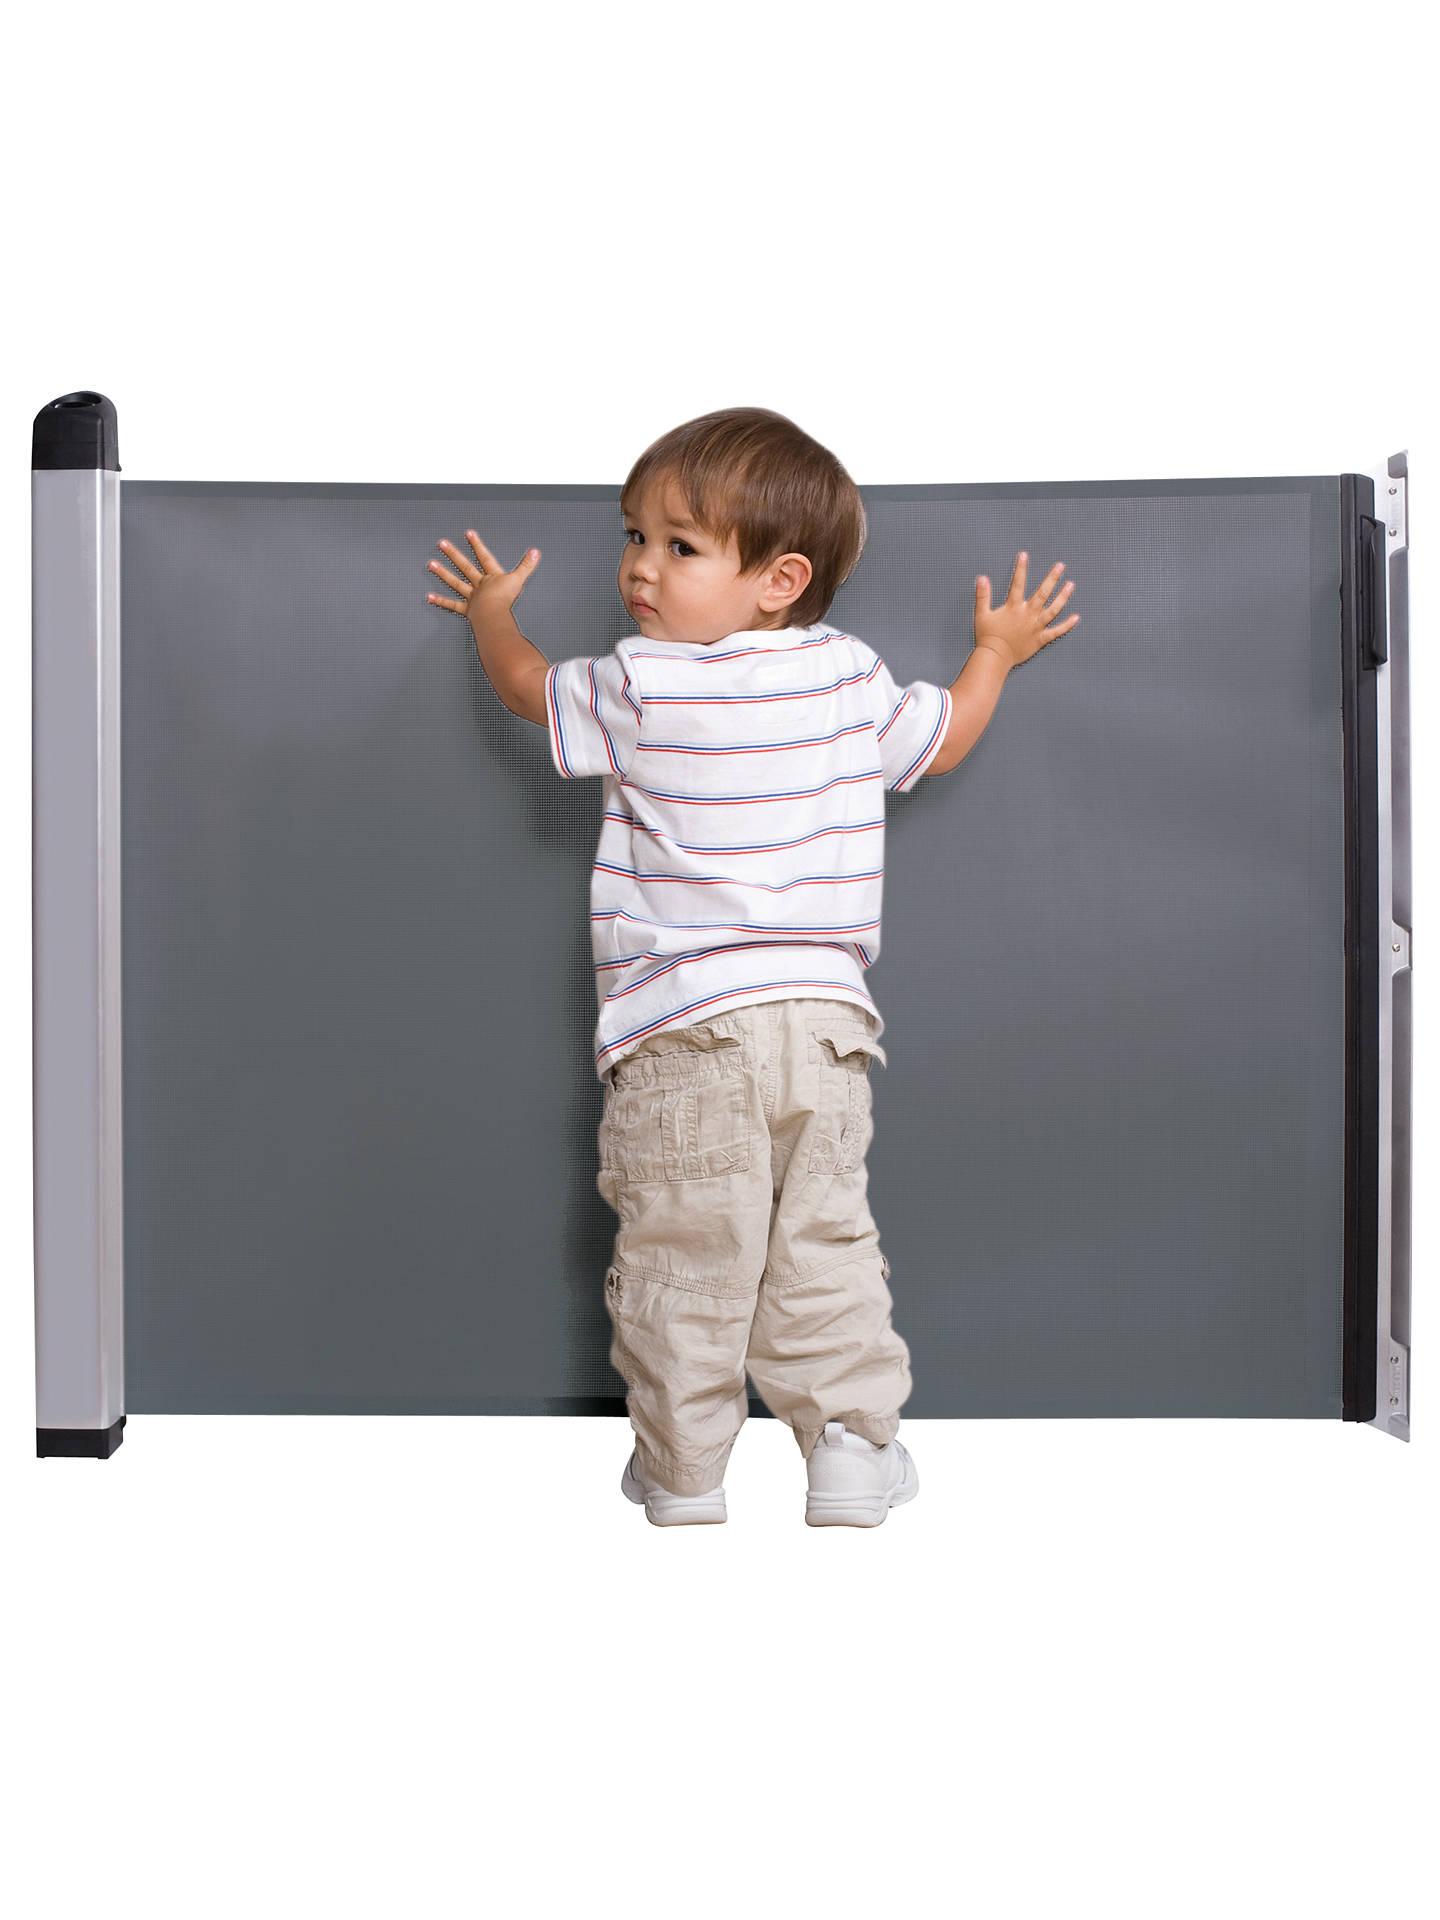 Lascal Kiddyguard Avant Safety Baby Gate at John Lewis & Partners